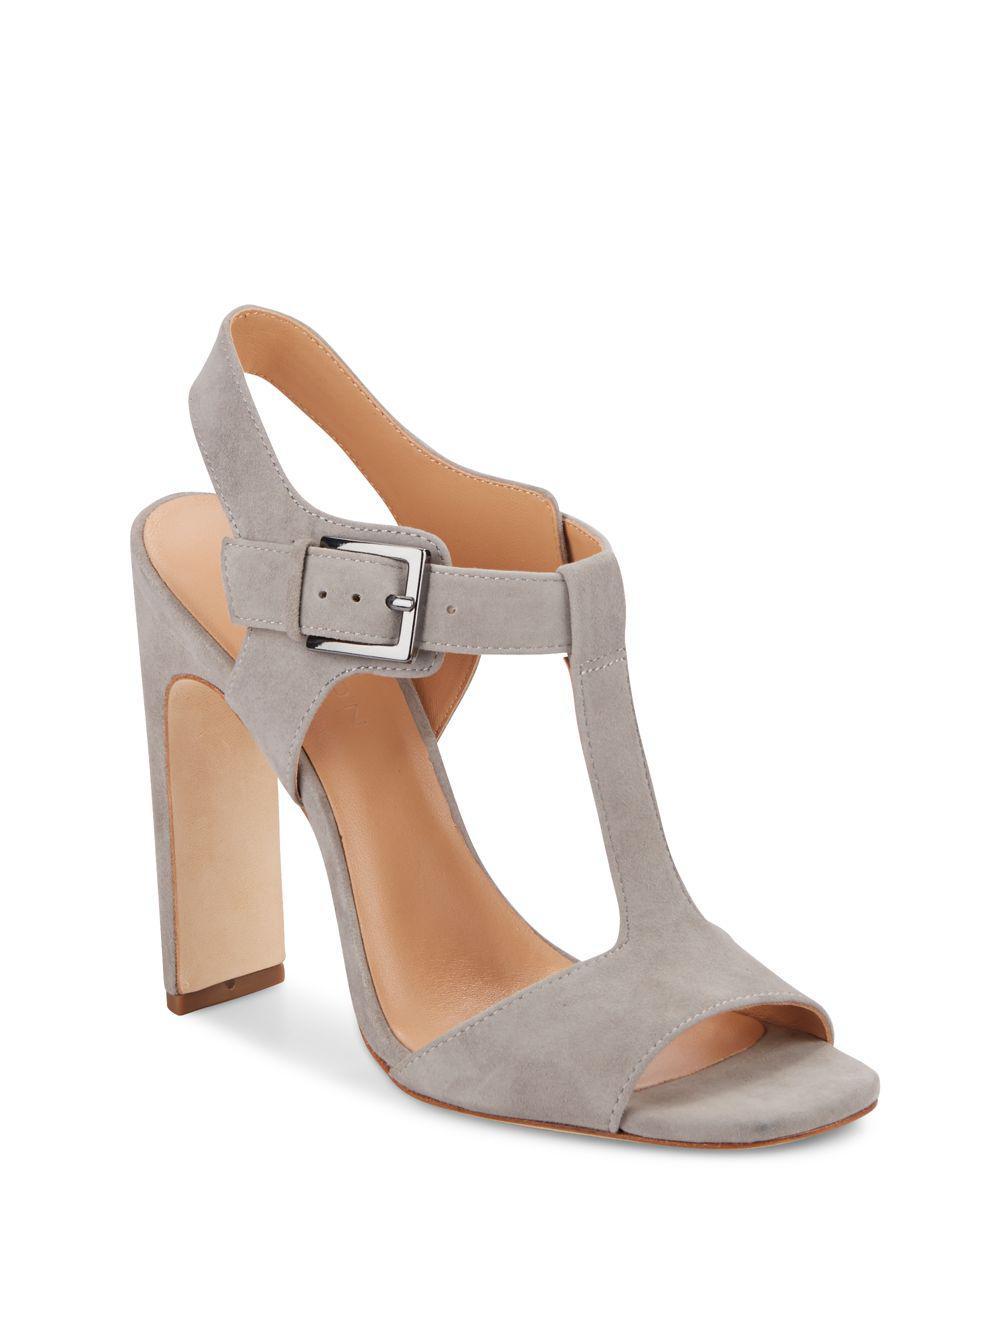 shop for sale online tumblr cheap online Halston Snakeskin Multistrap Sandals discount with credit card 8WsnEnFt8x